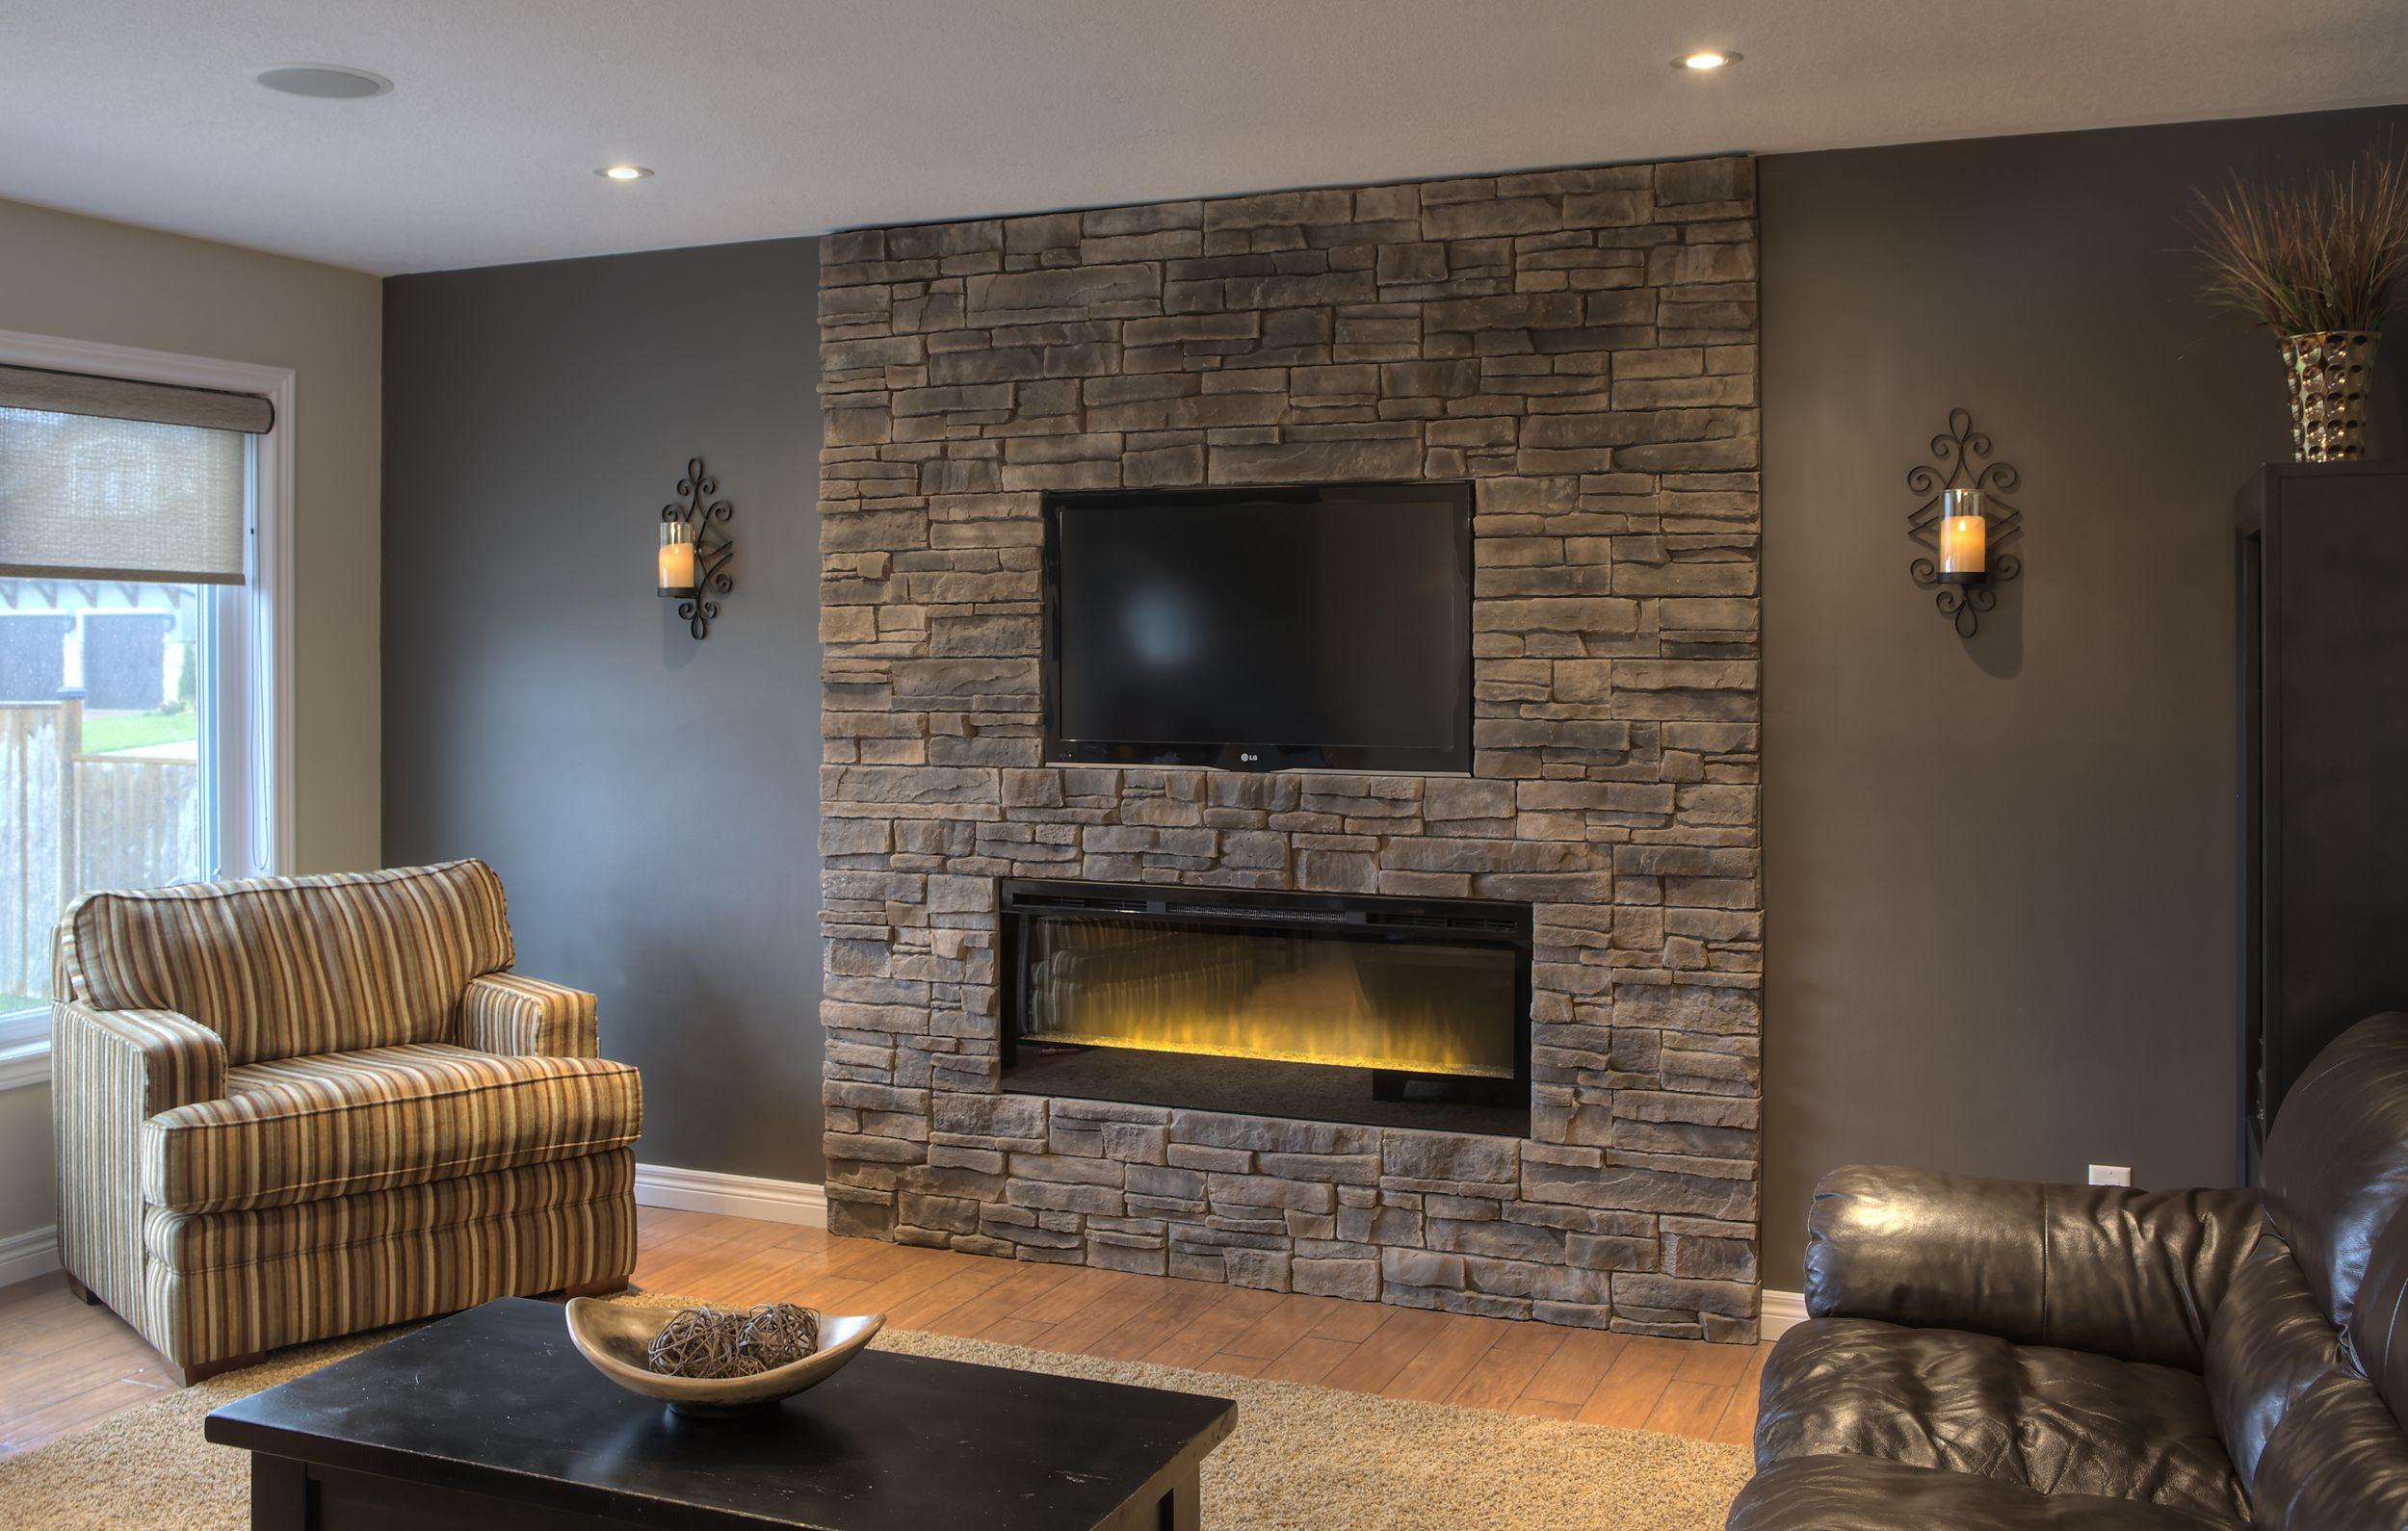 Diy Stone Install Fusion Great Lakes Stone In Raven Woonkamer Met Open Haard Stenen Muur Huis Inrichting Industrieel